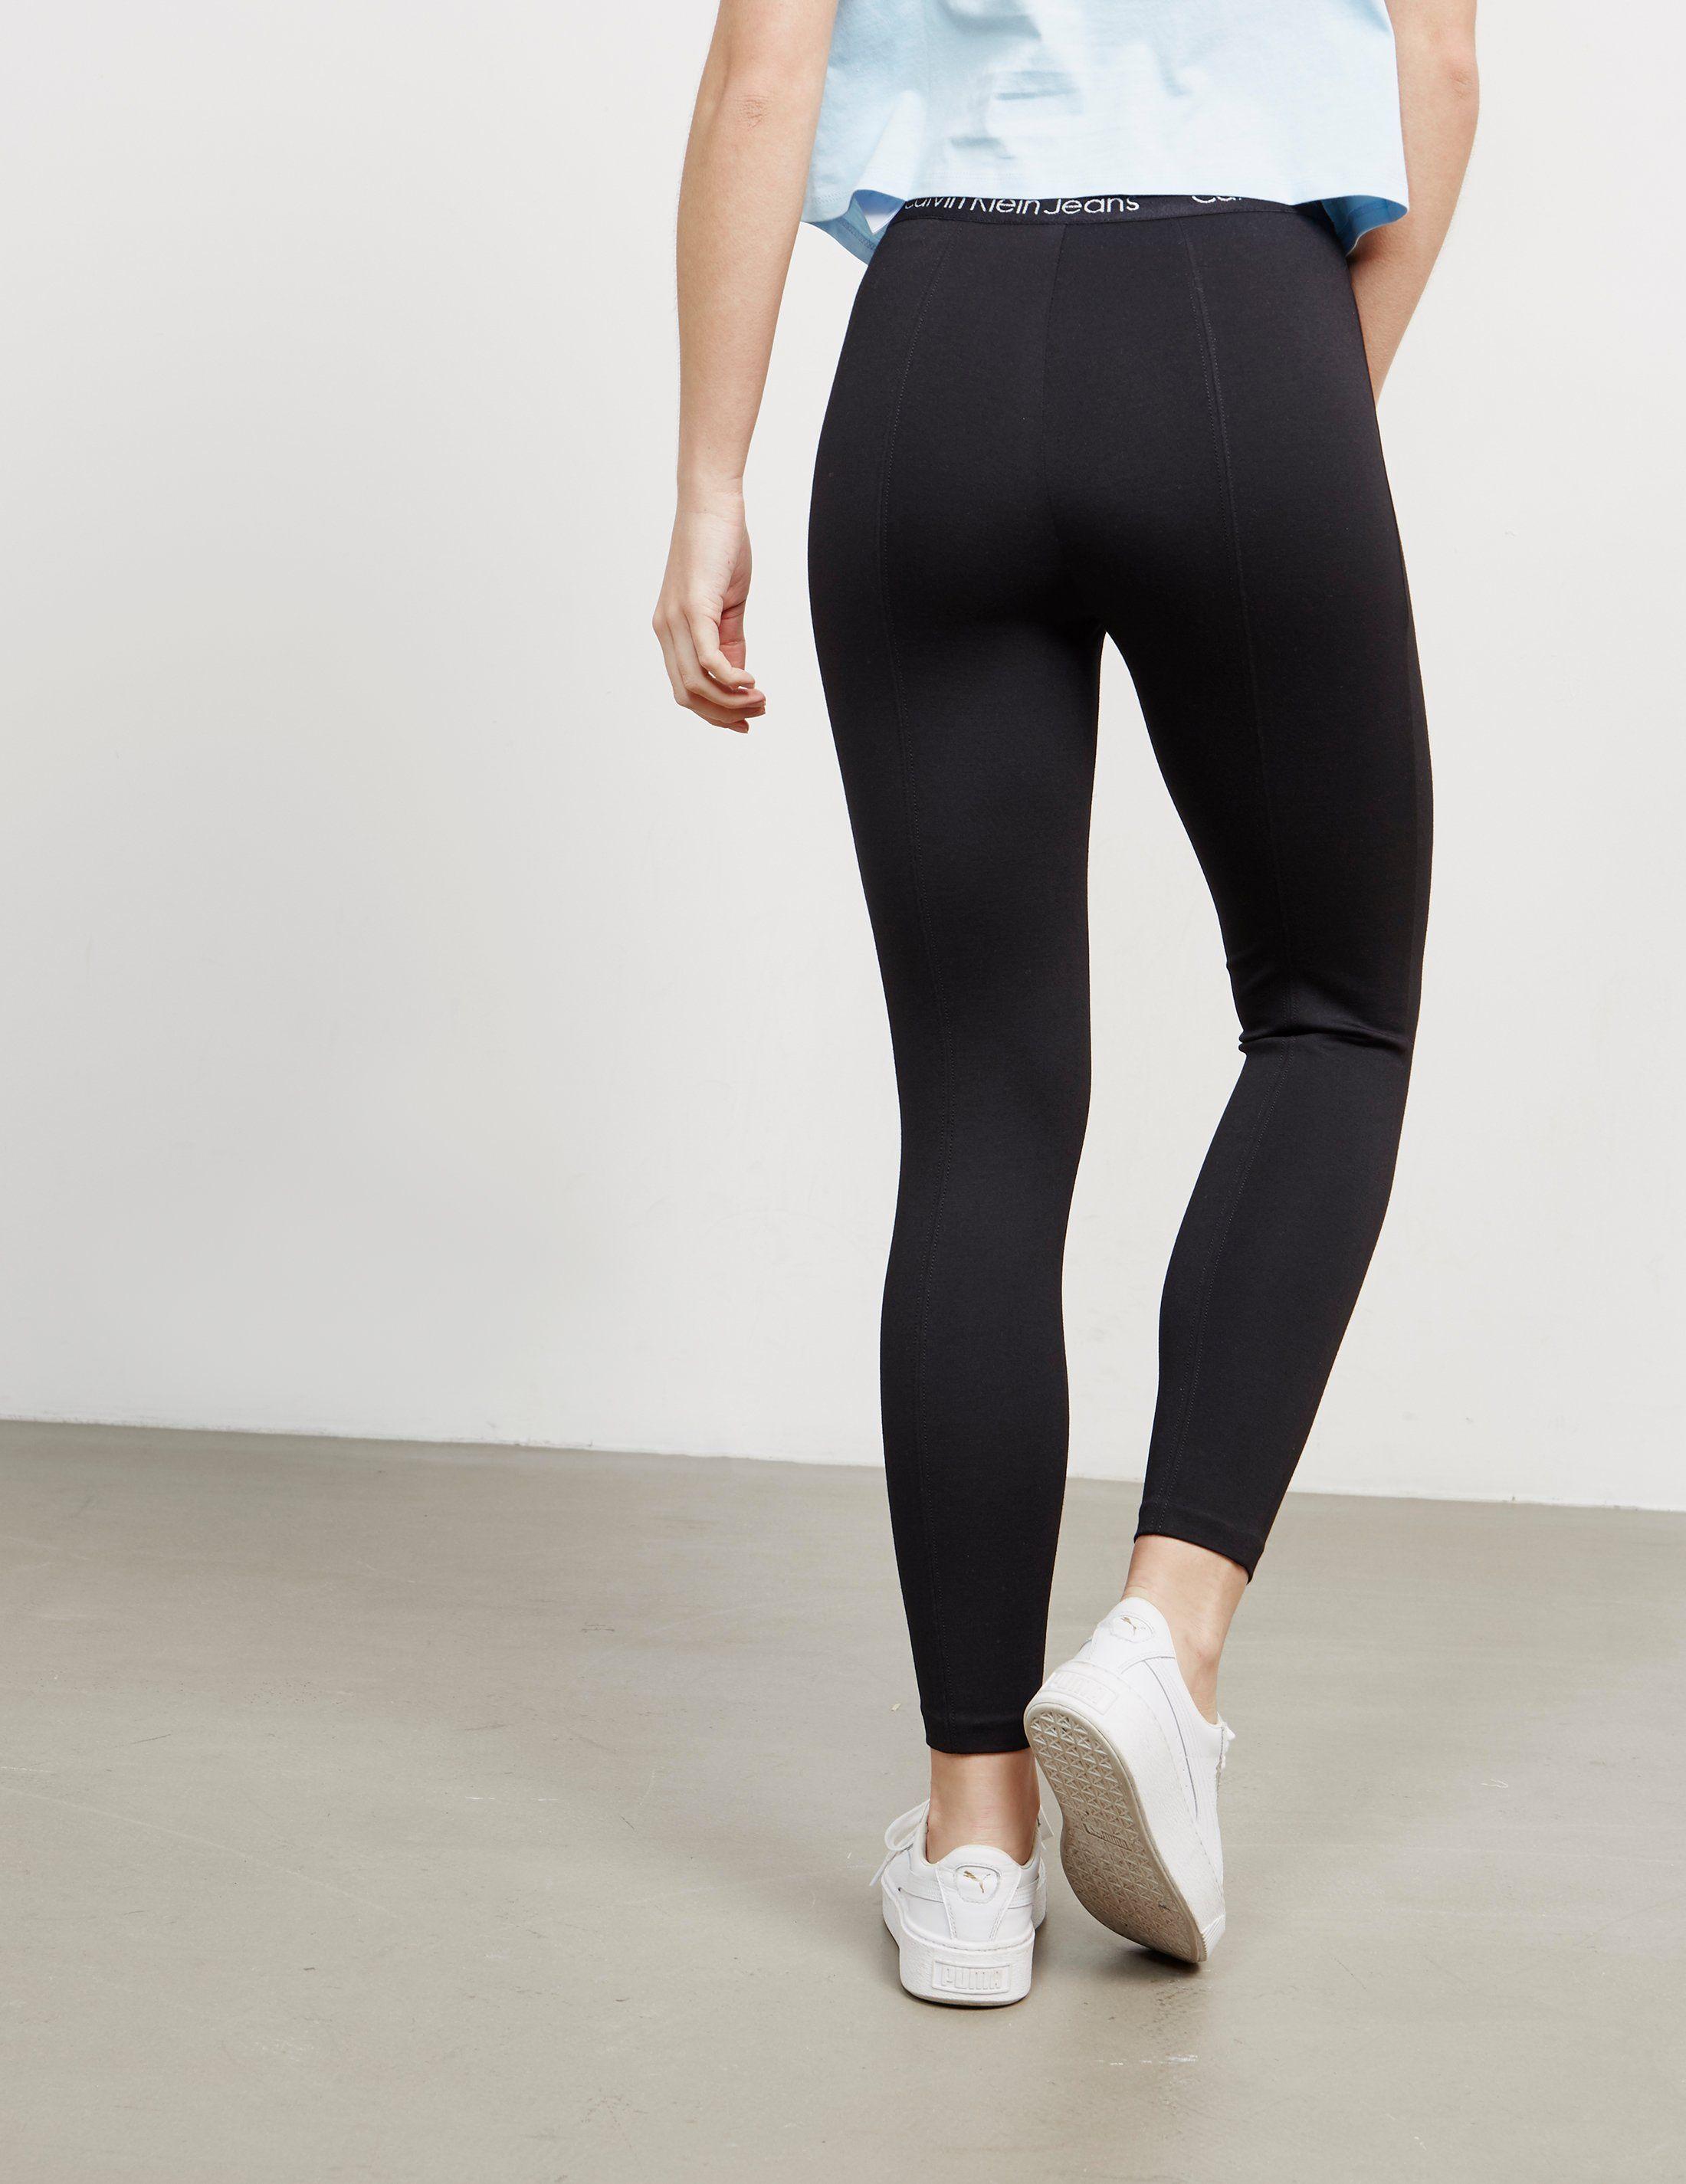 Calvin Klein Logo Leggings